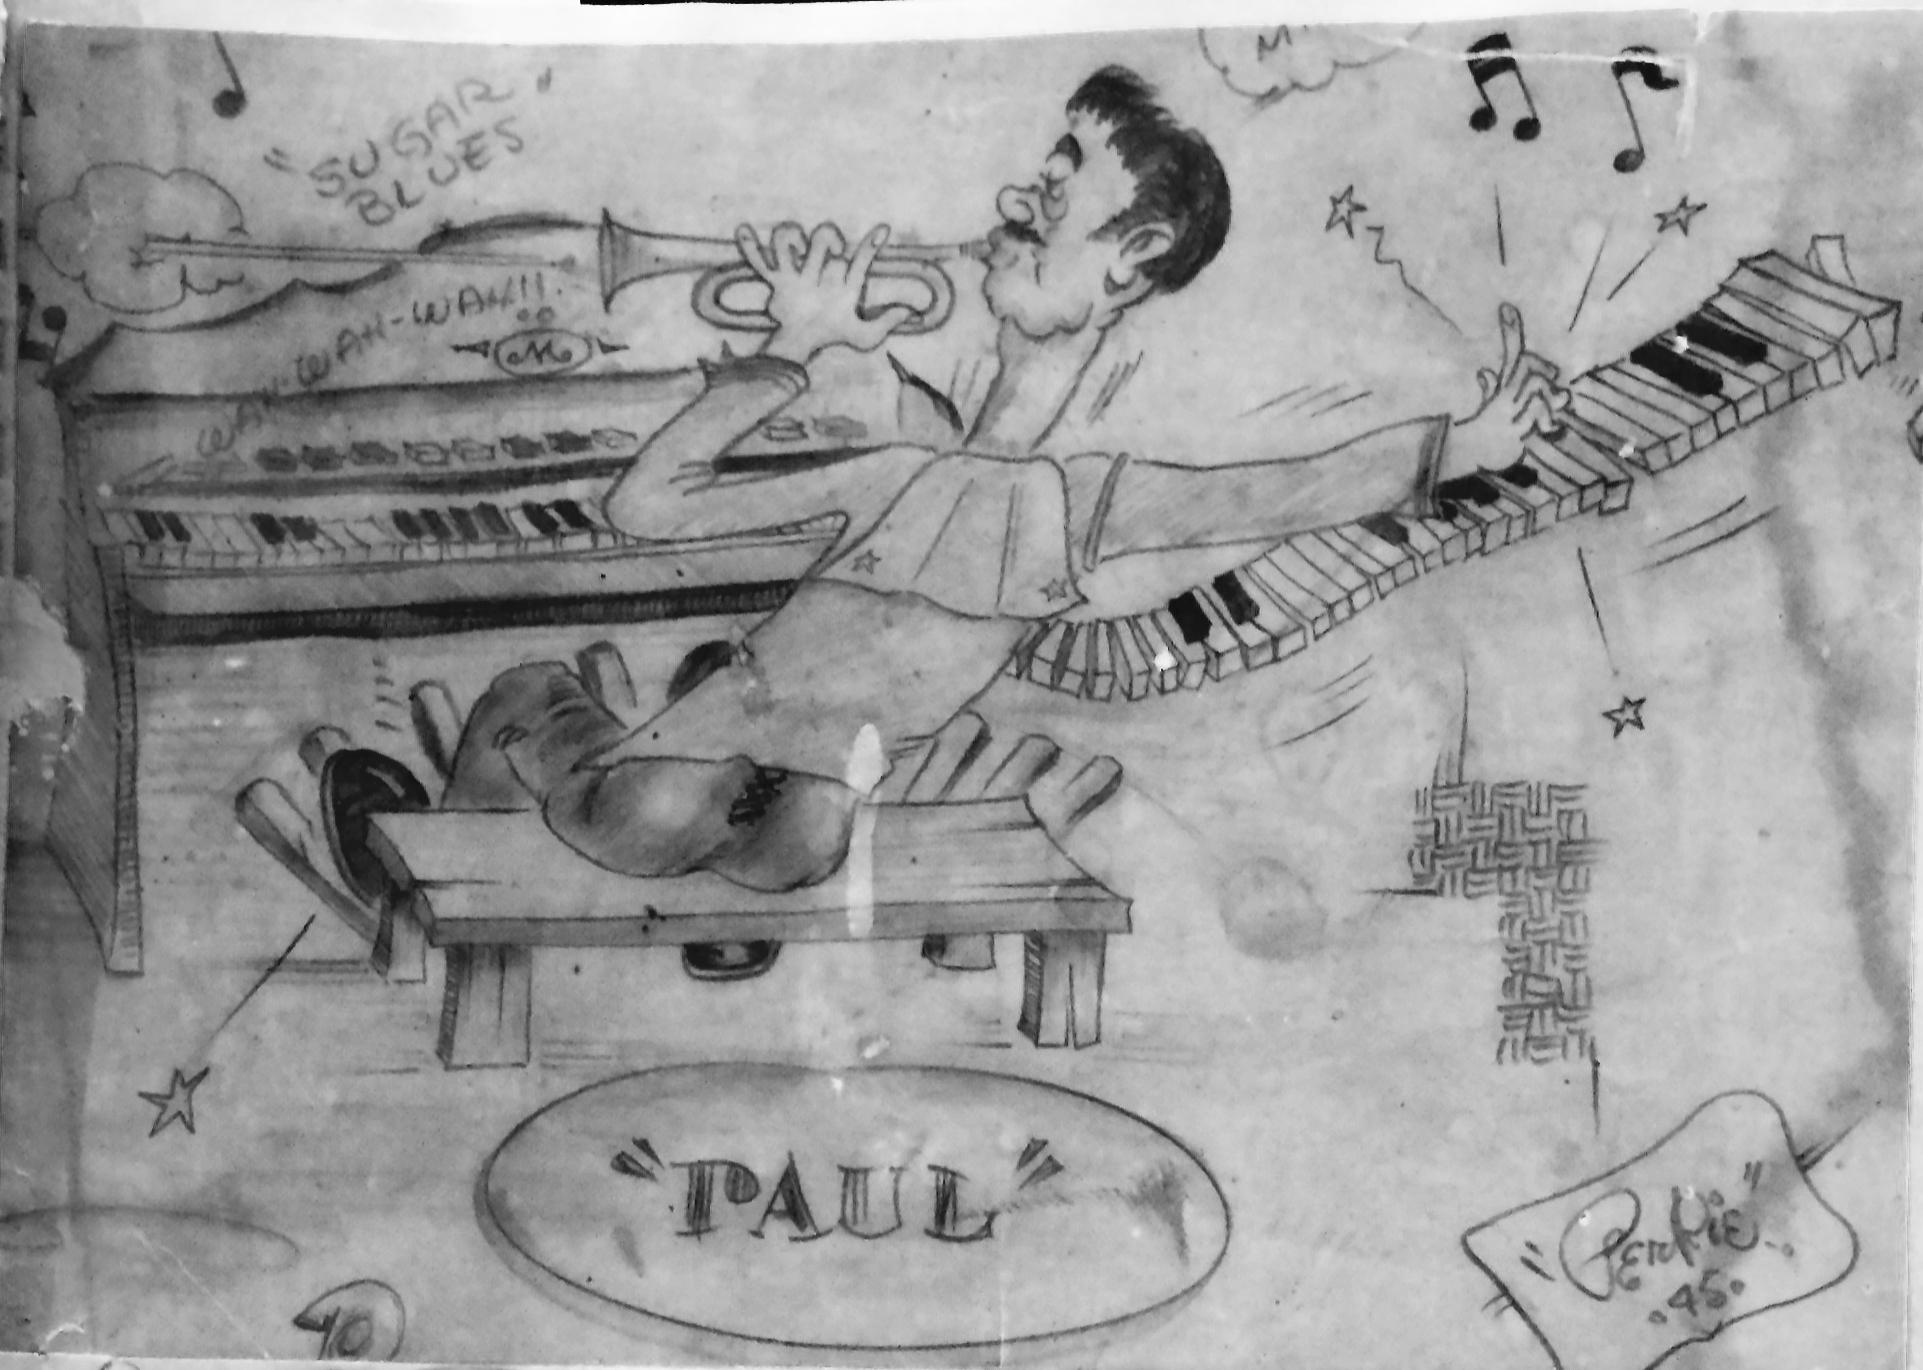 Paul'sCartoon1.jpg